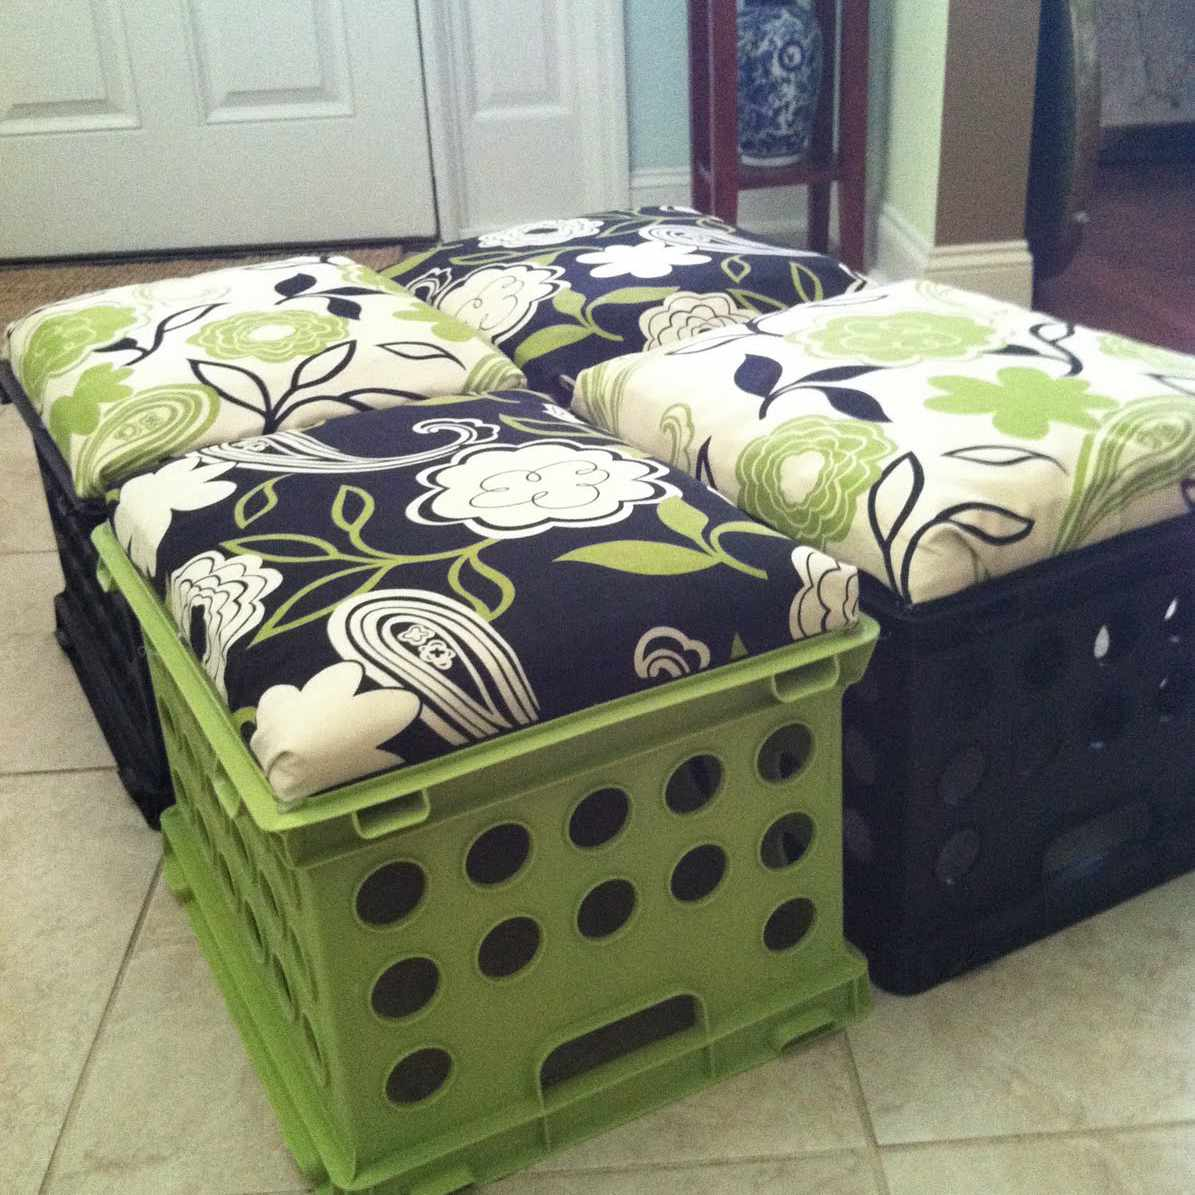 Milk crate storage bench DIY